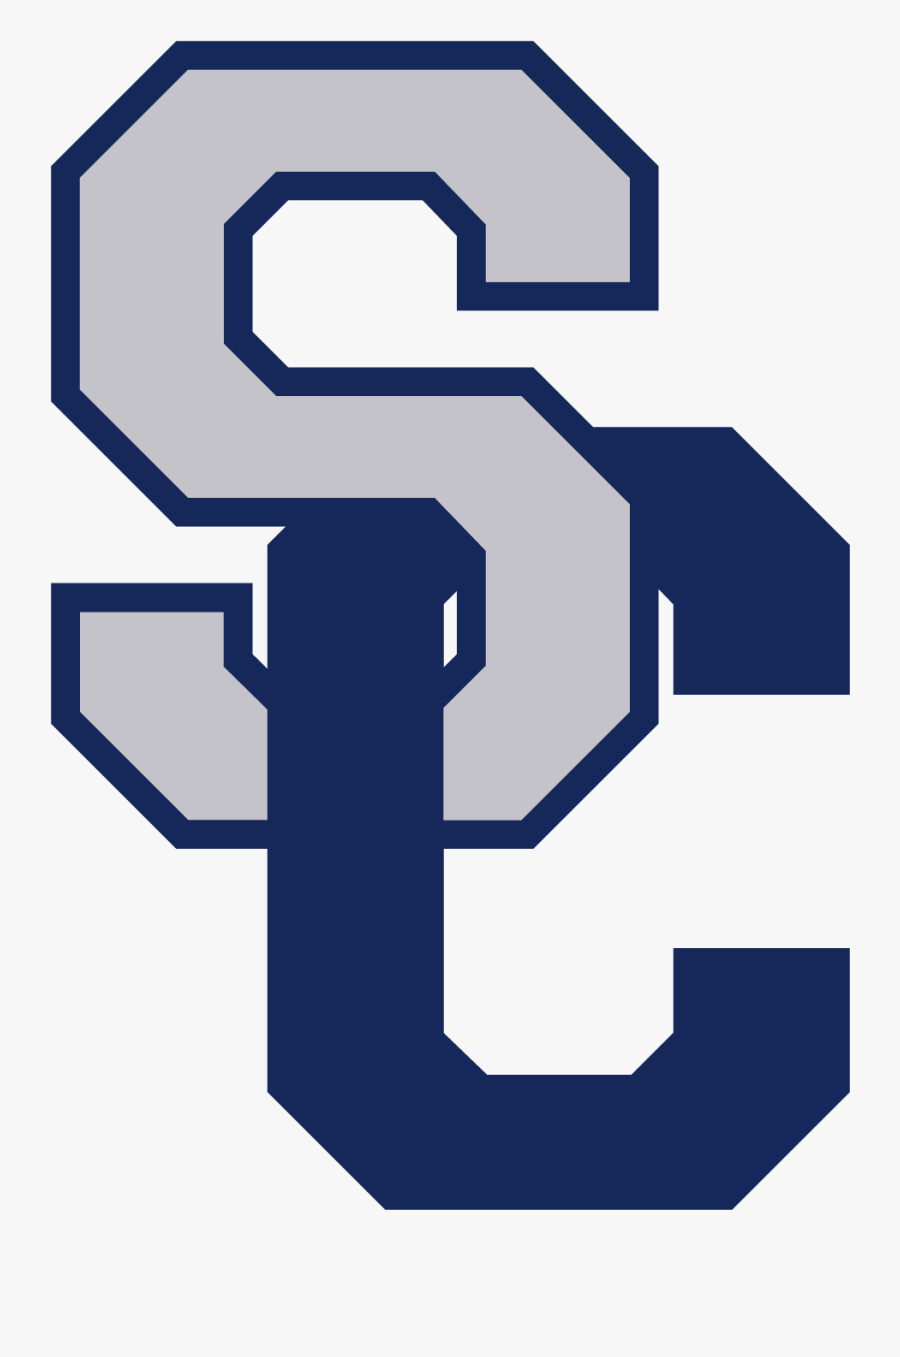 South Central Illinois Schools , Transparent Cartoons - South Central Logo, Transparent Clipart